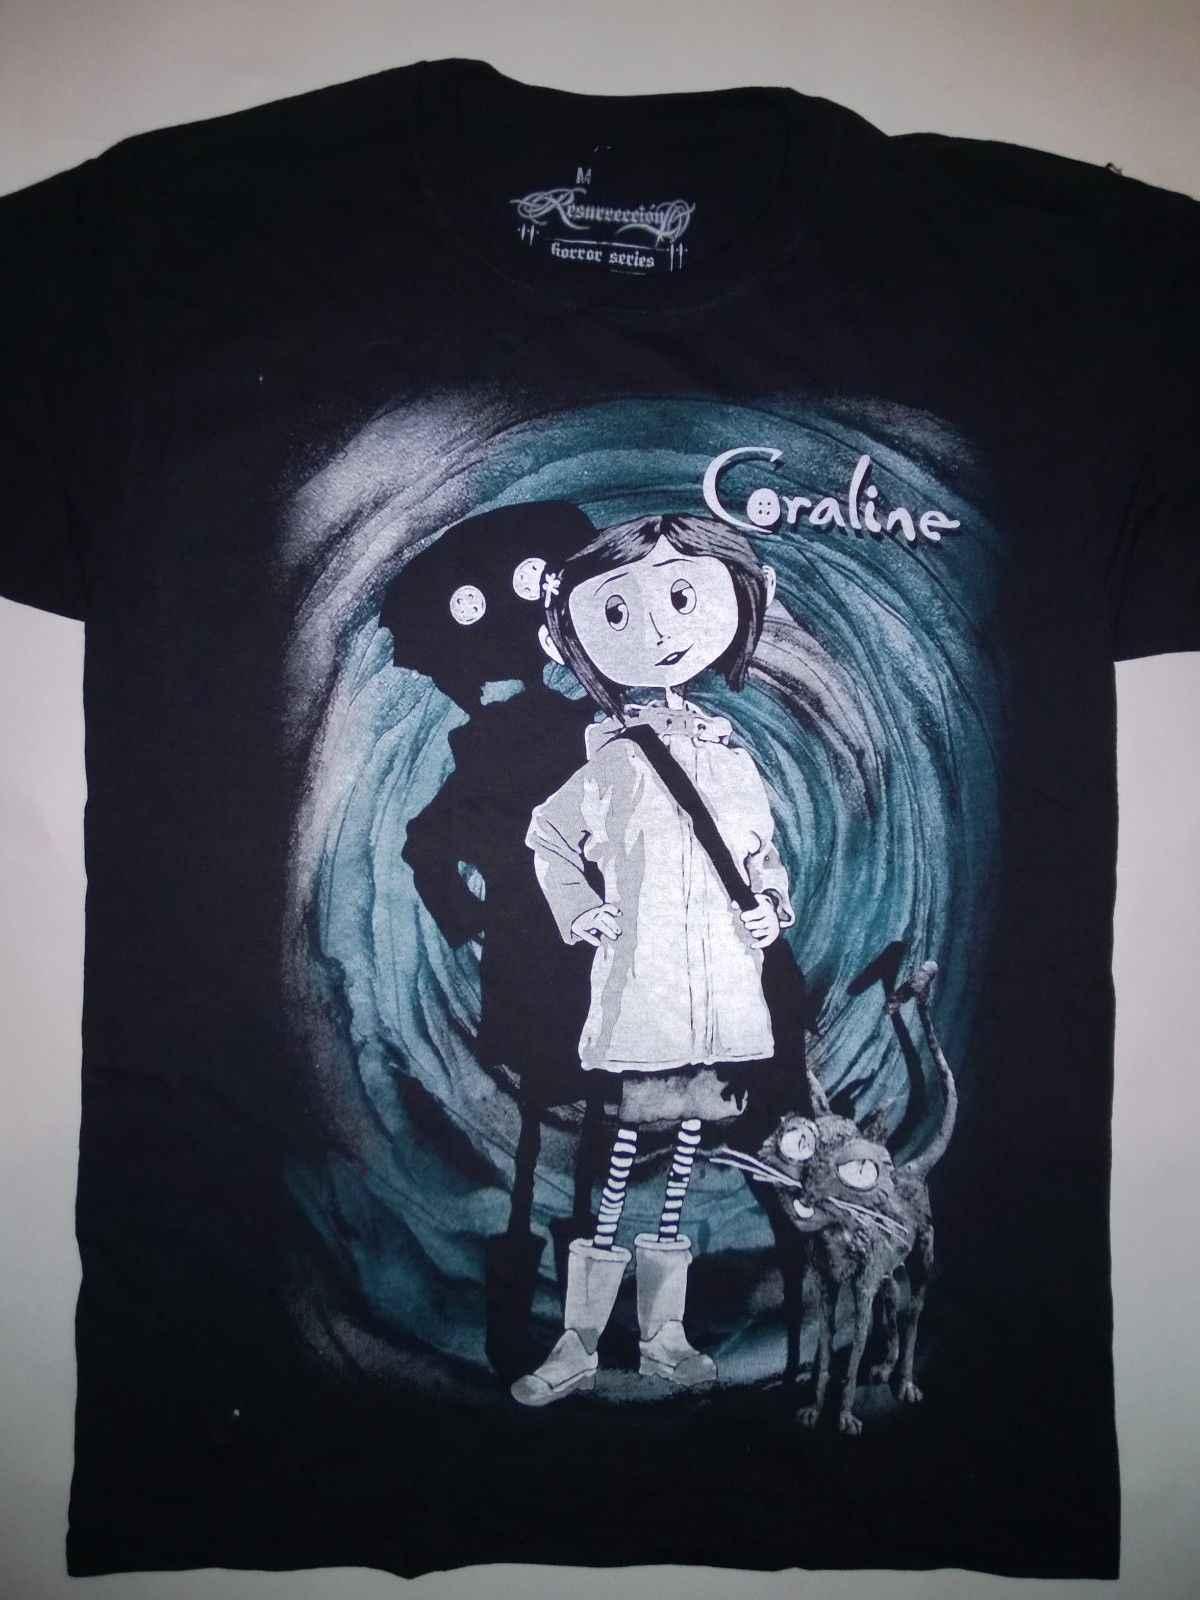 Tim Burton Christmas Jumper.Coraline T Shirt Tim Burton Neil Gaiman Nightmare Before